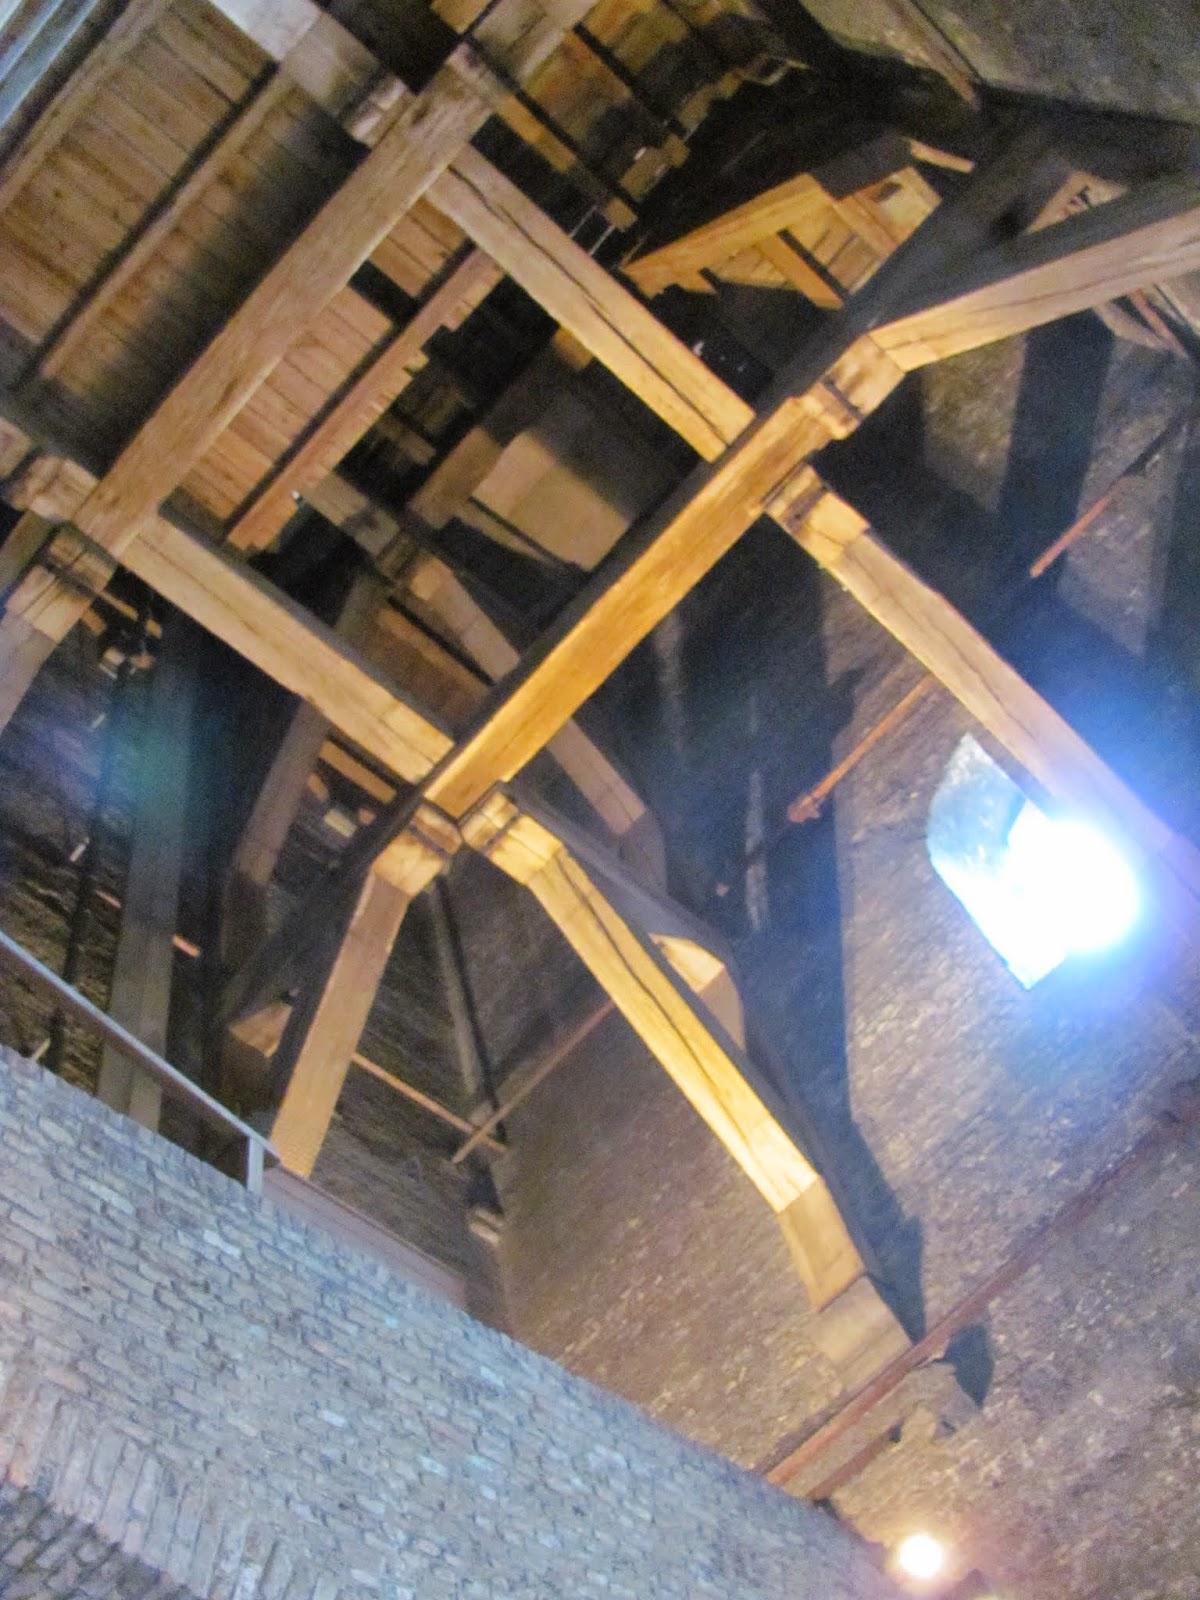 Bell Tower Innards Bruges, Belgium